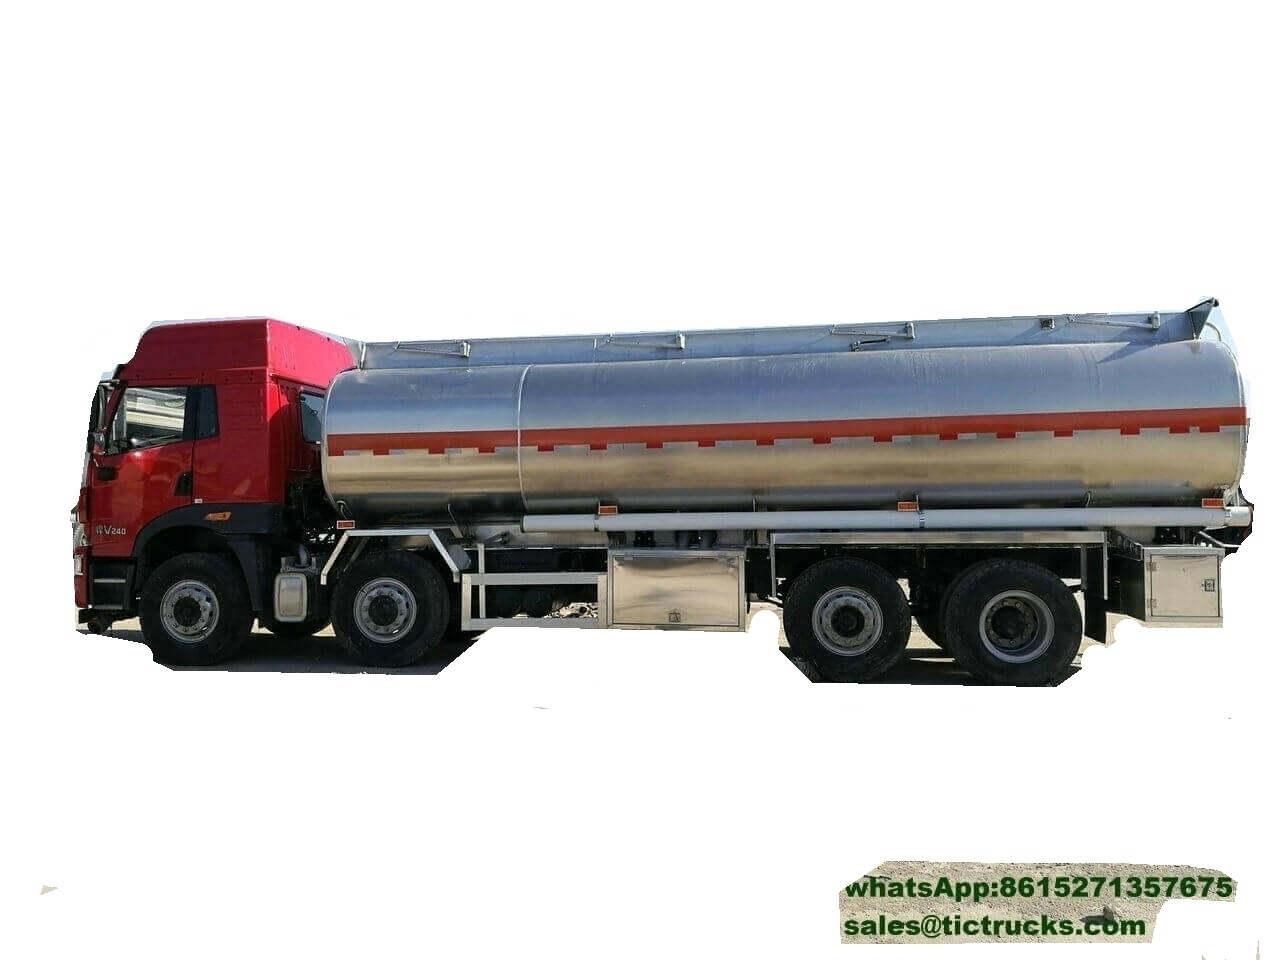 Camion-citerne -006-FAW-truck_1.jpg d'alliage d'aluminium